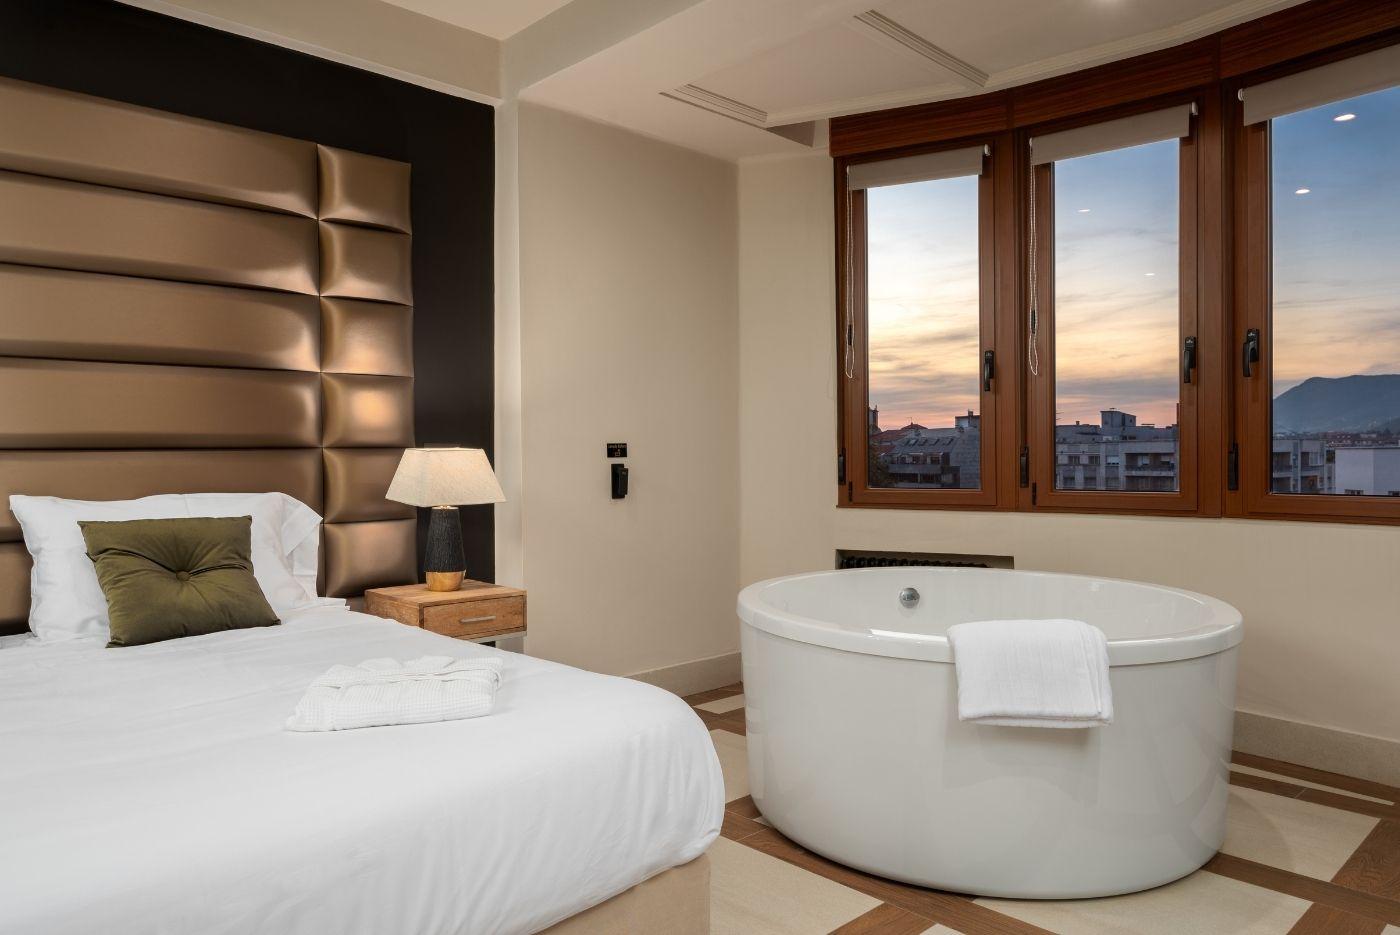 Apartamento-Suite-Deluxe-64-Oviedo-1907-01